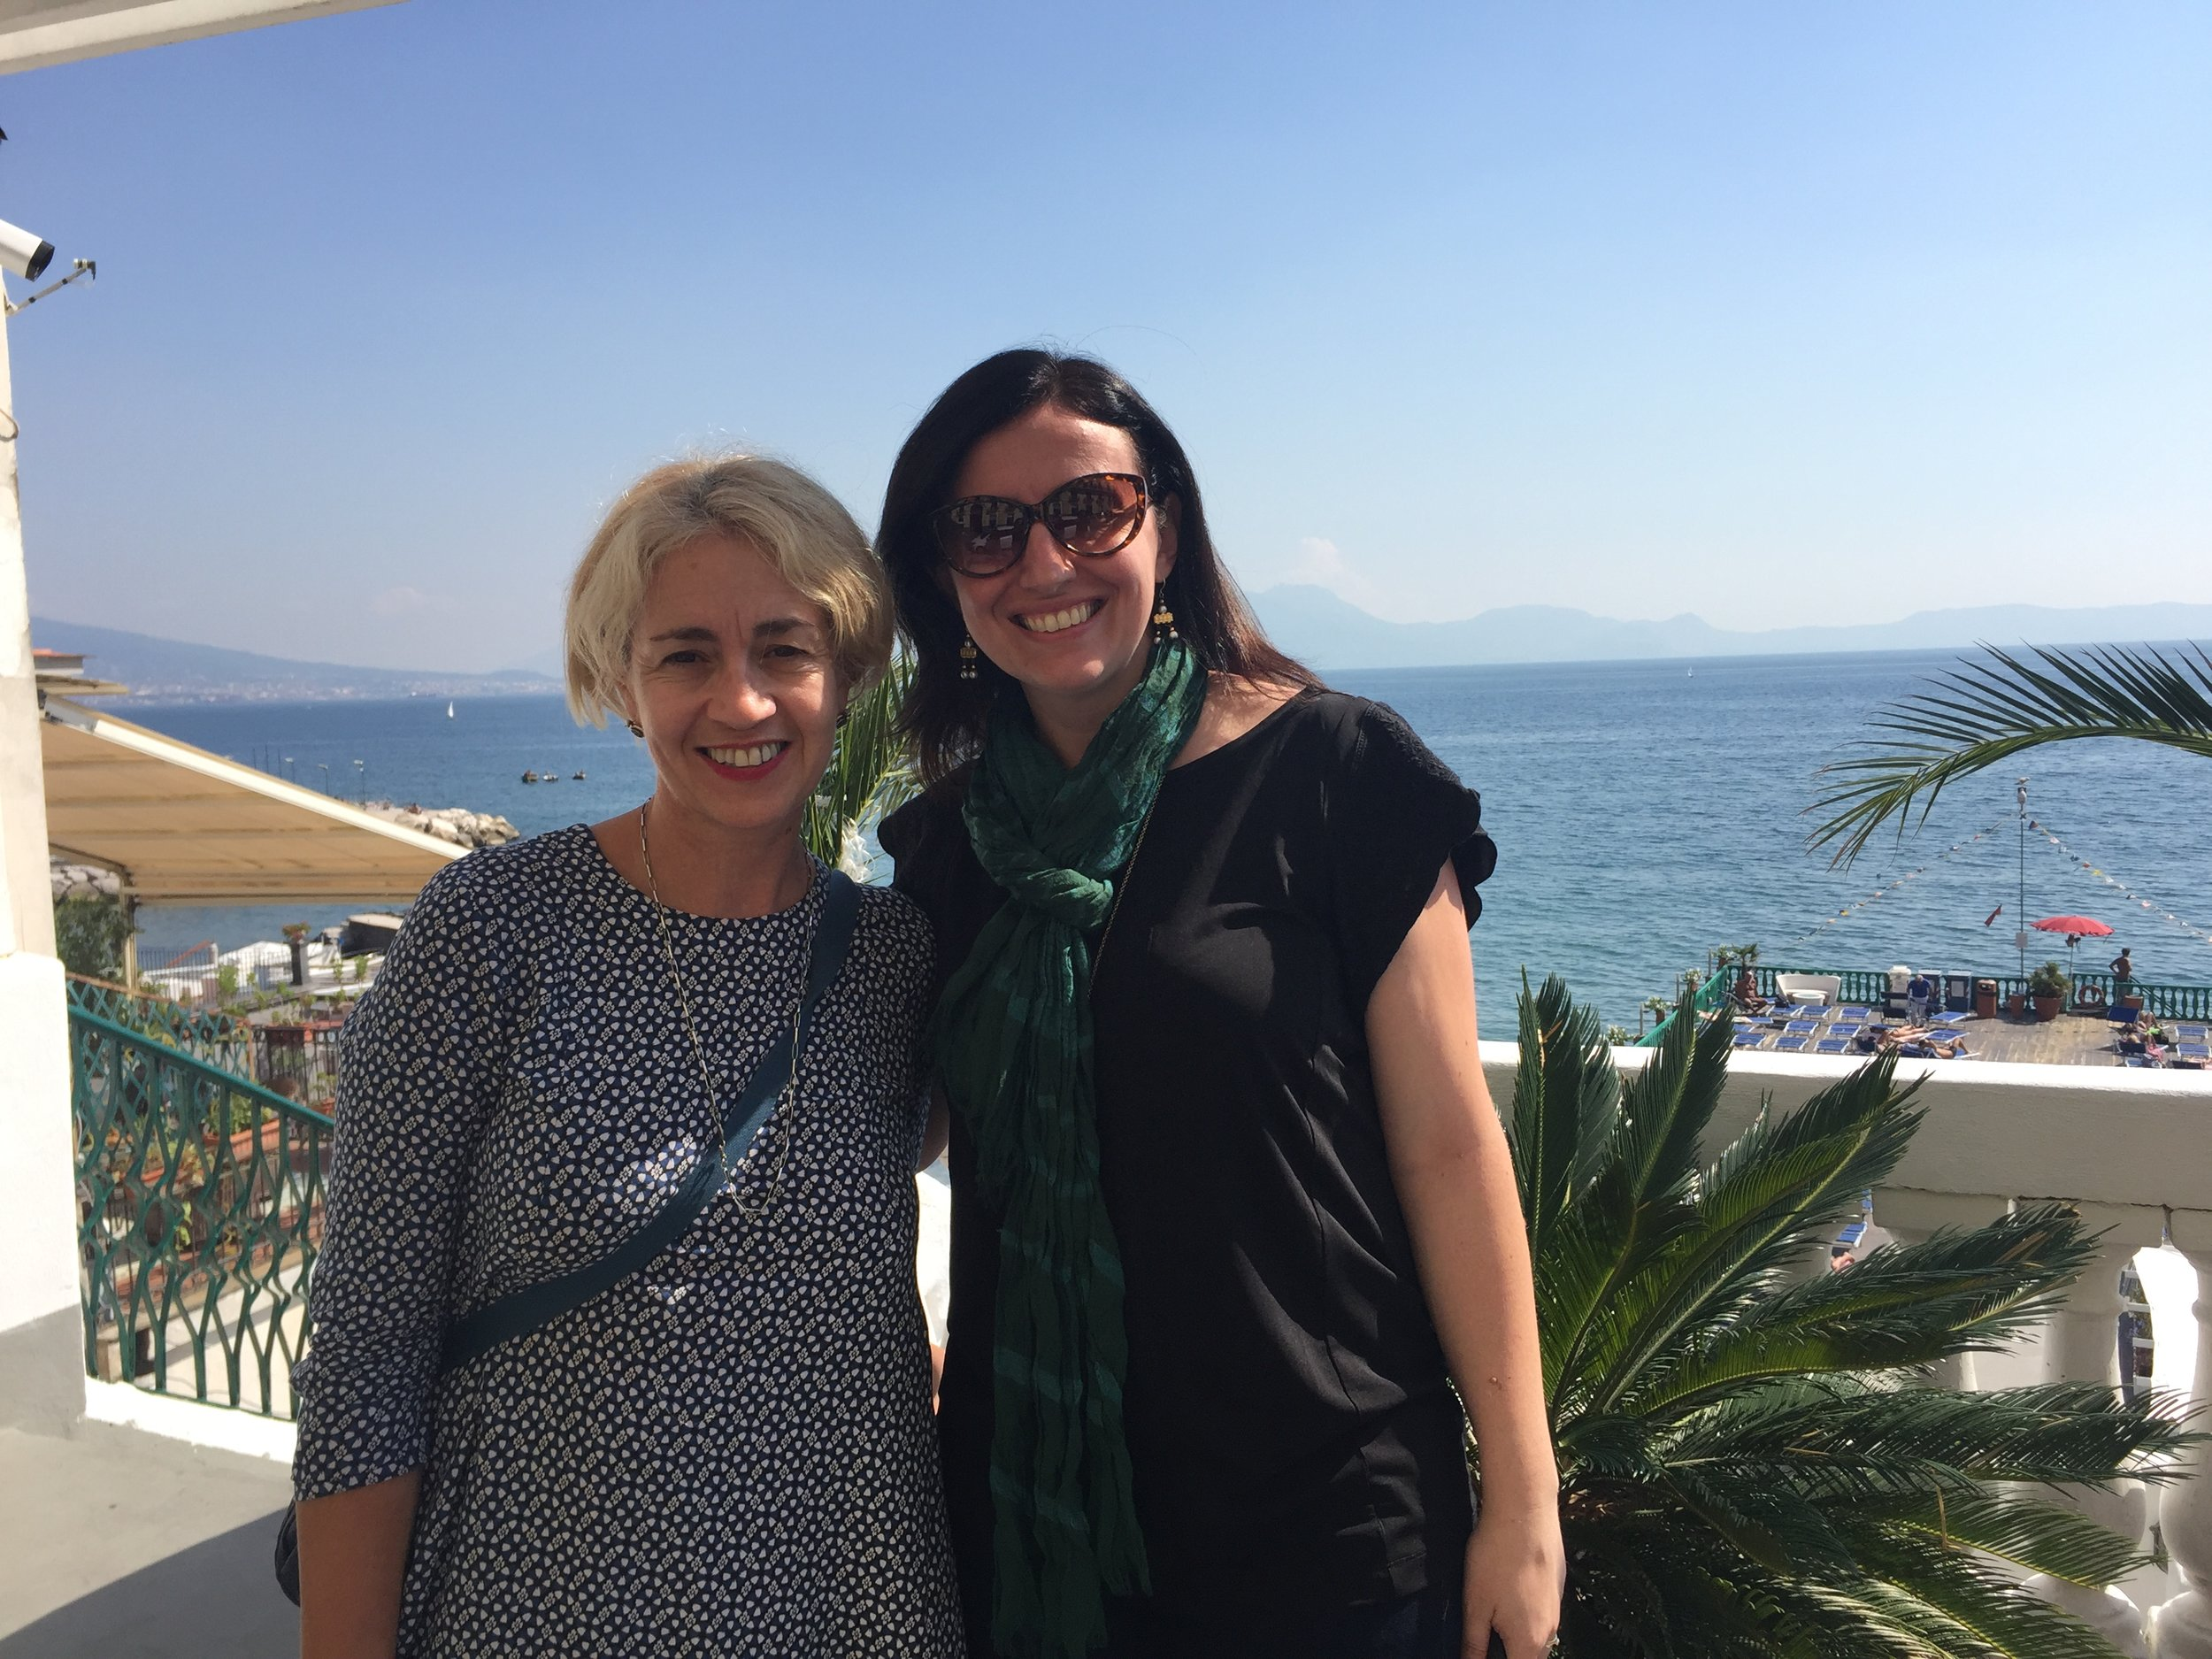 Danielle Oteri & Francesca Sinaschalchi